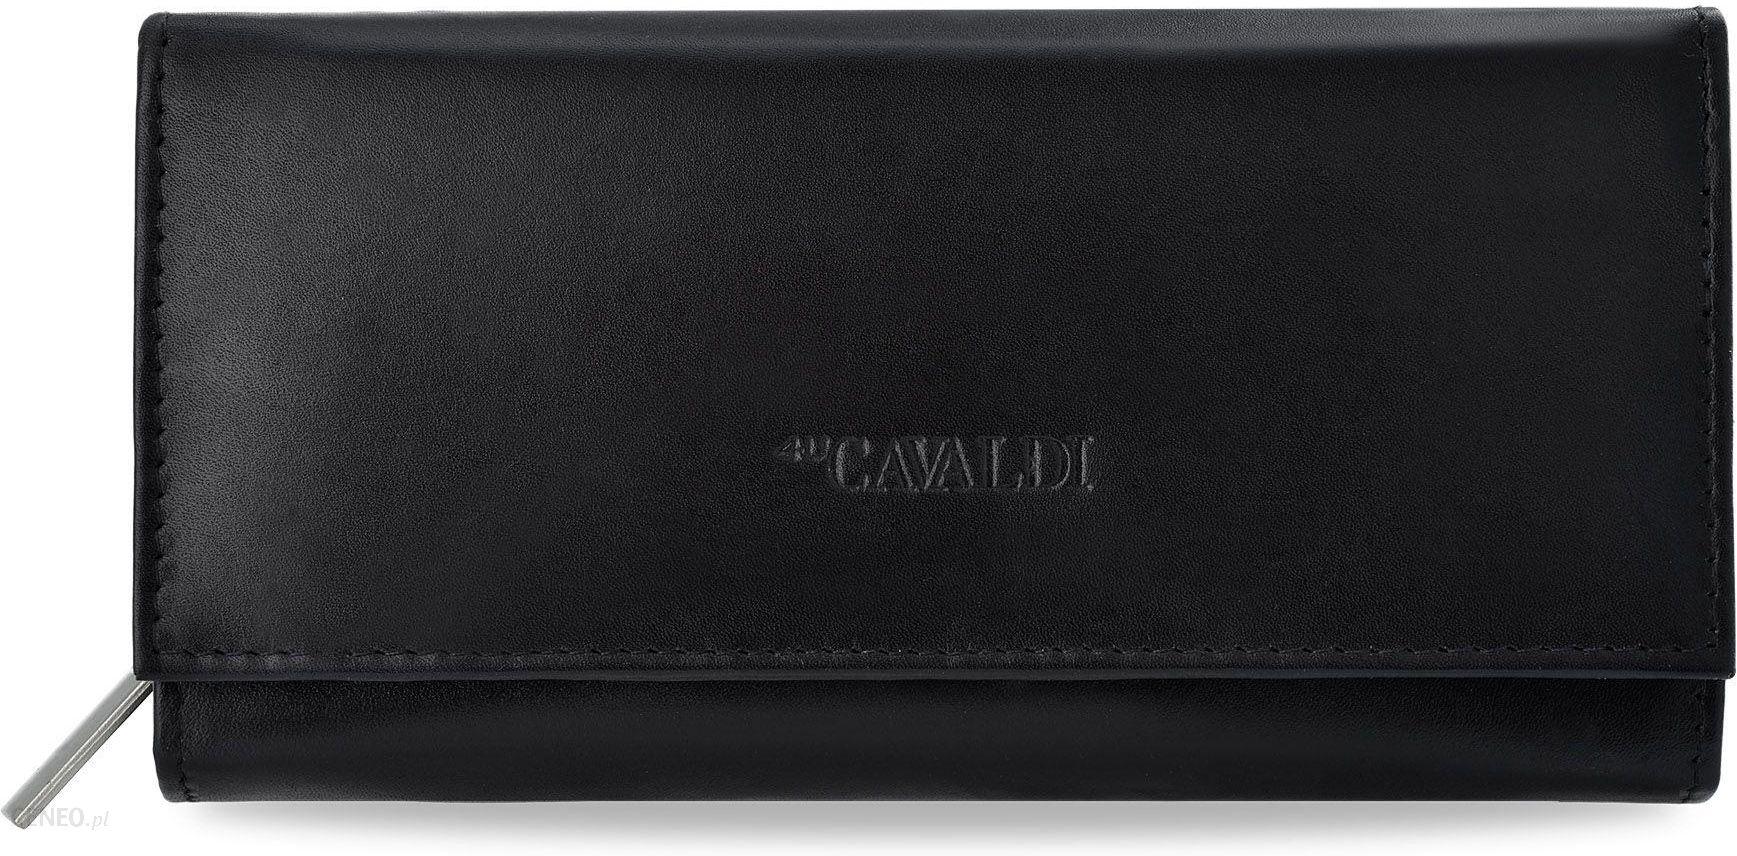 ed65a03a09455 Klasyczny portfel damski cavaldi harmonijka skóra naturalna - czarny -  zdjęcie 1